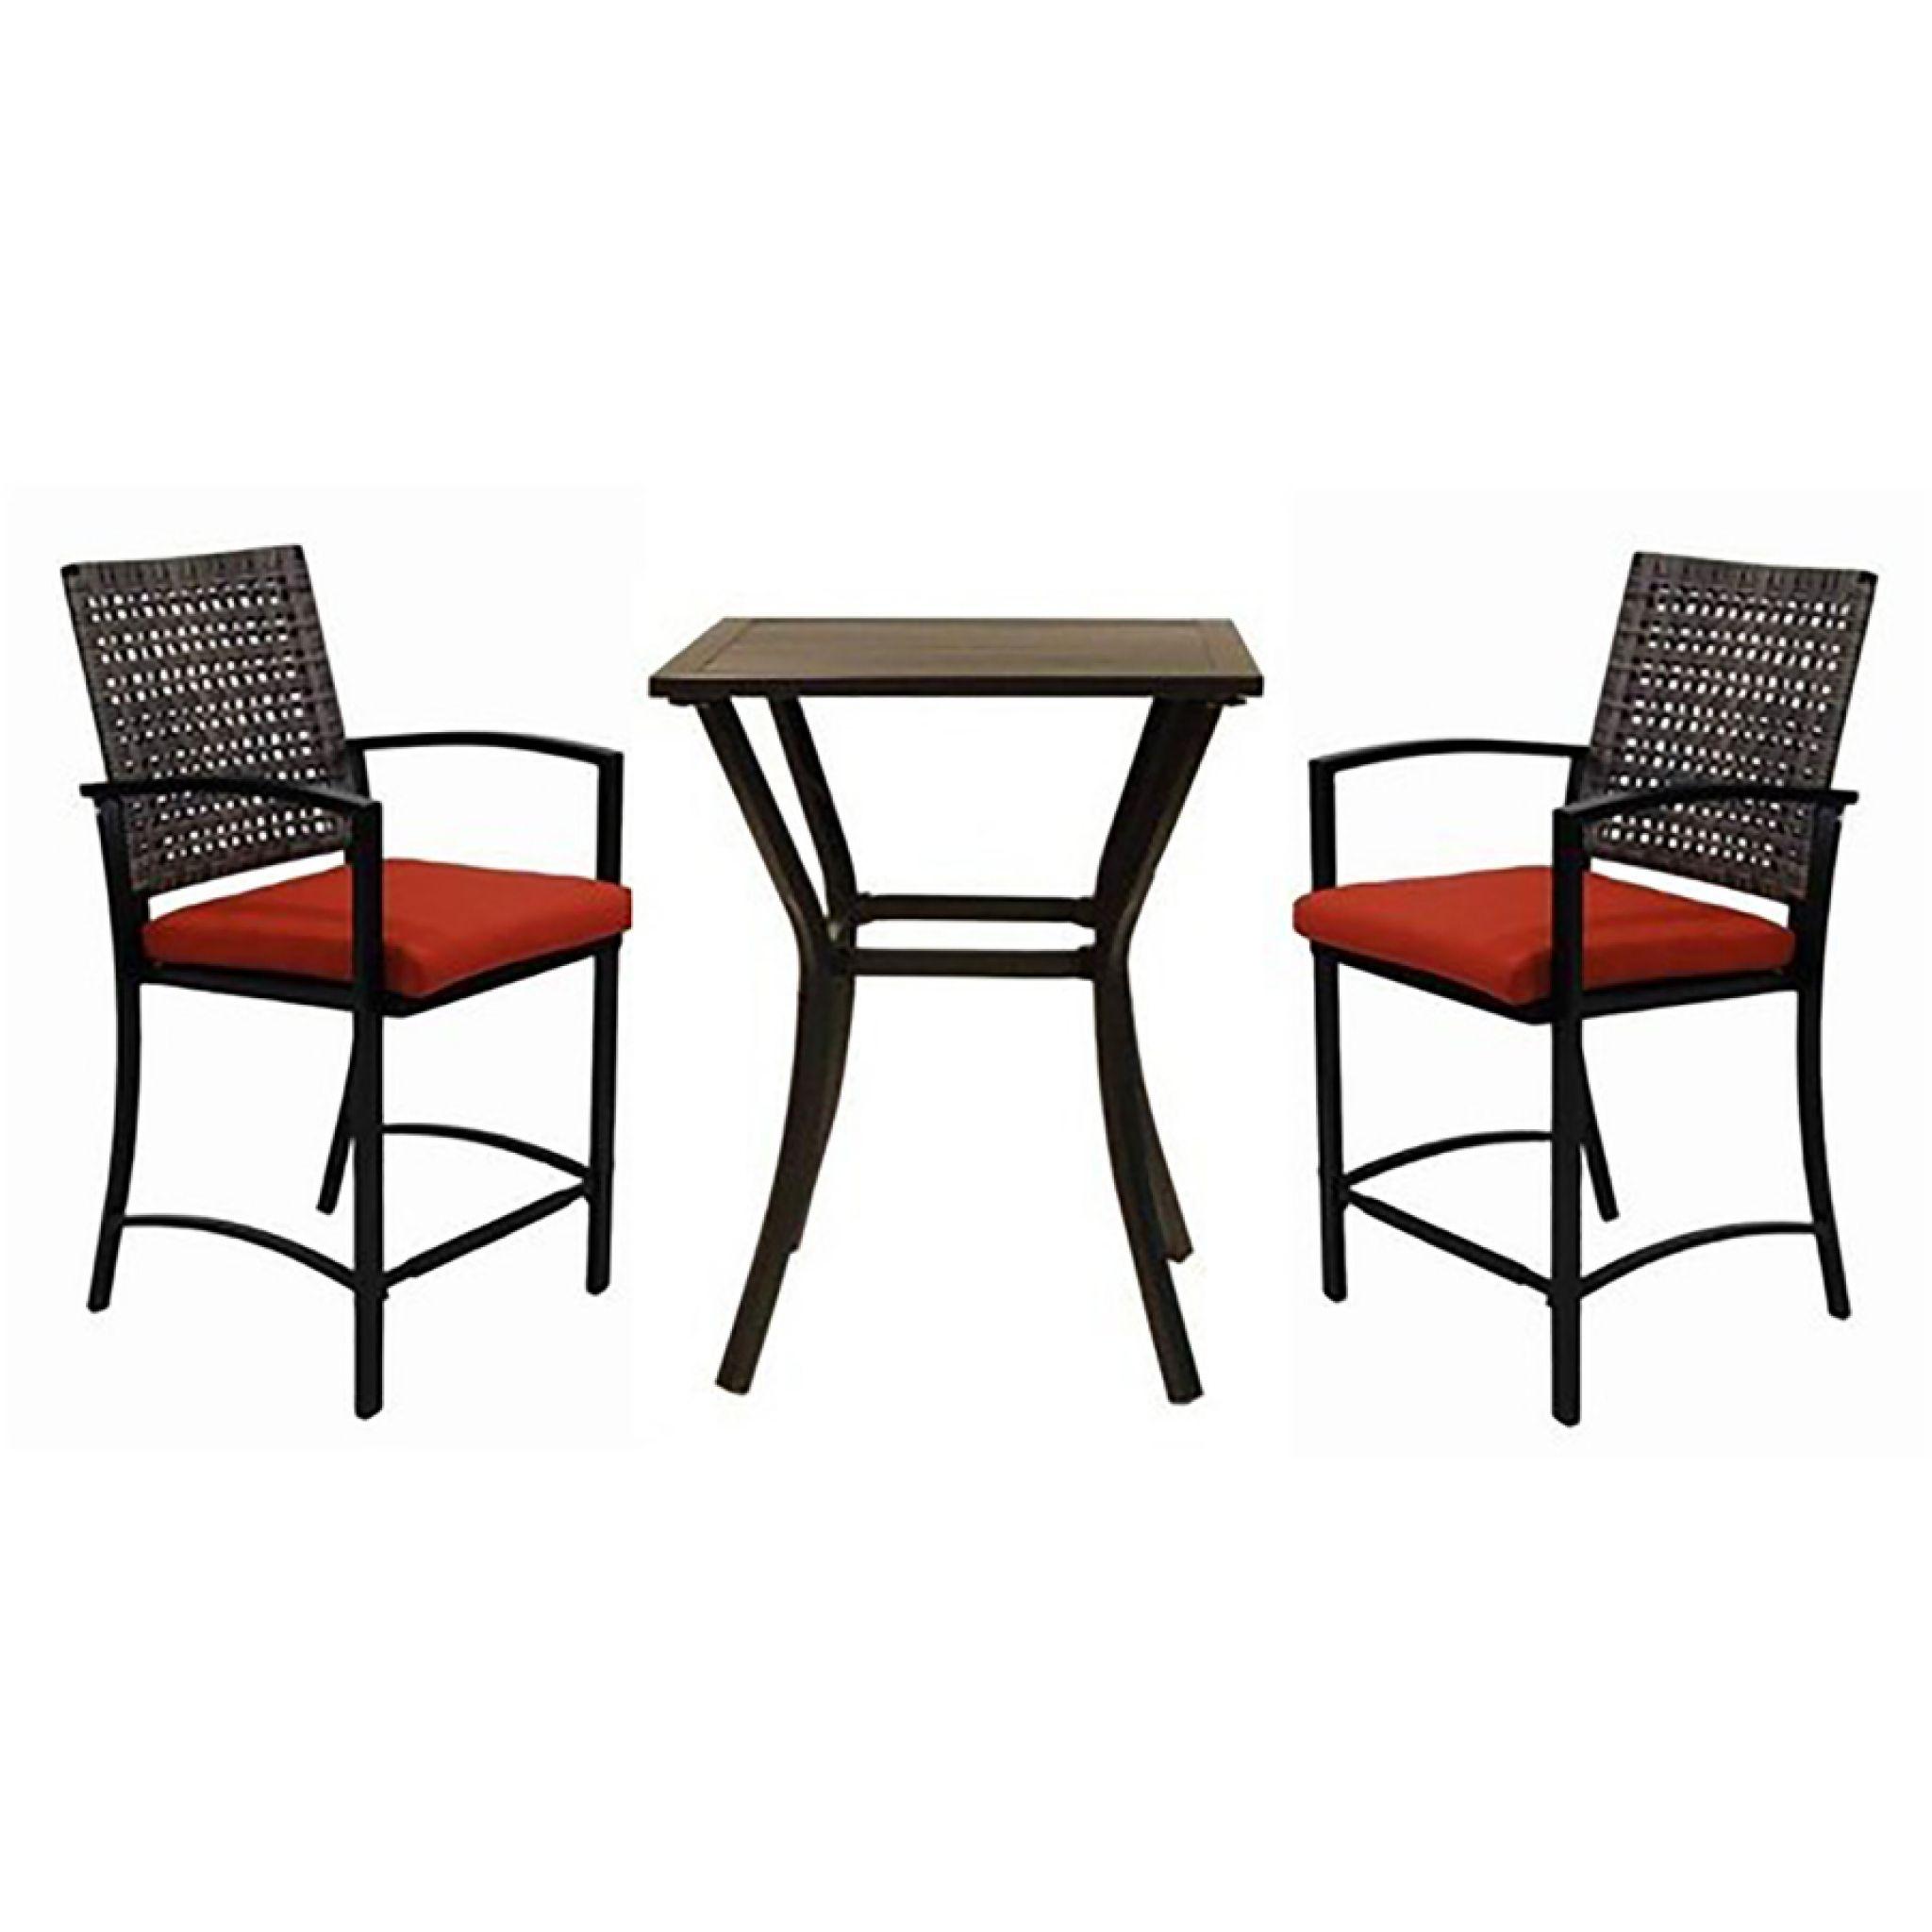 white jordan wicker luxury furniture modern patio chairs los design outdoor designer angeles porch trendy s clearance